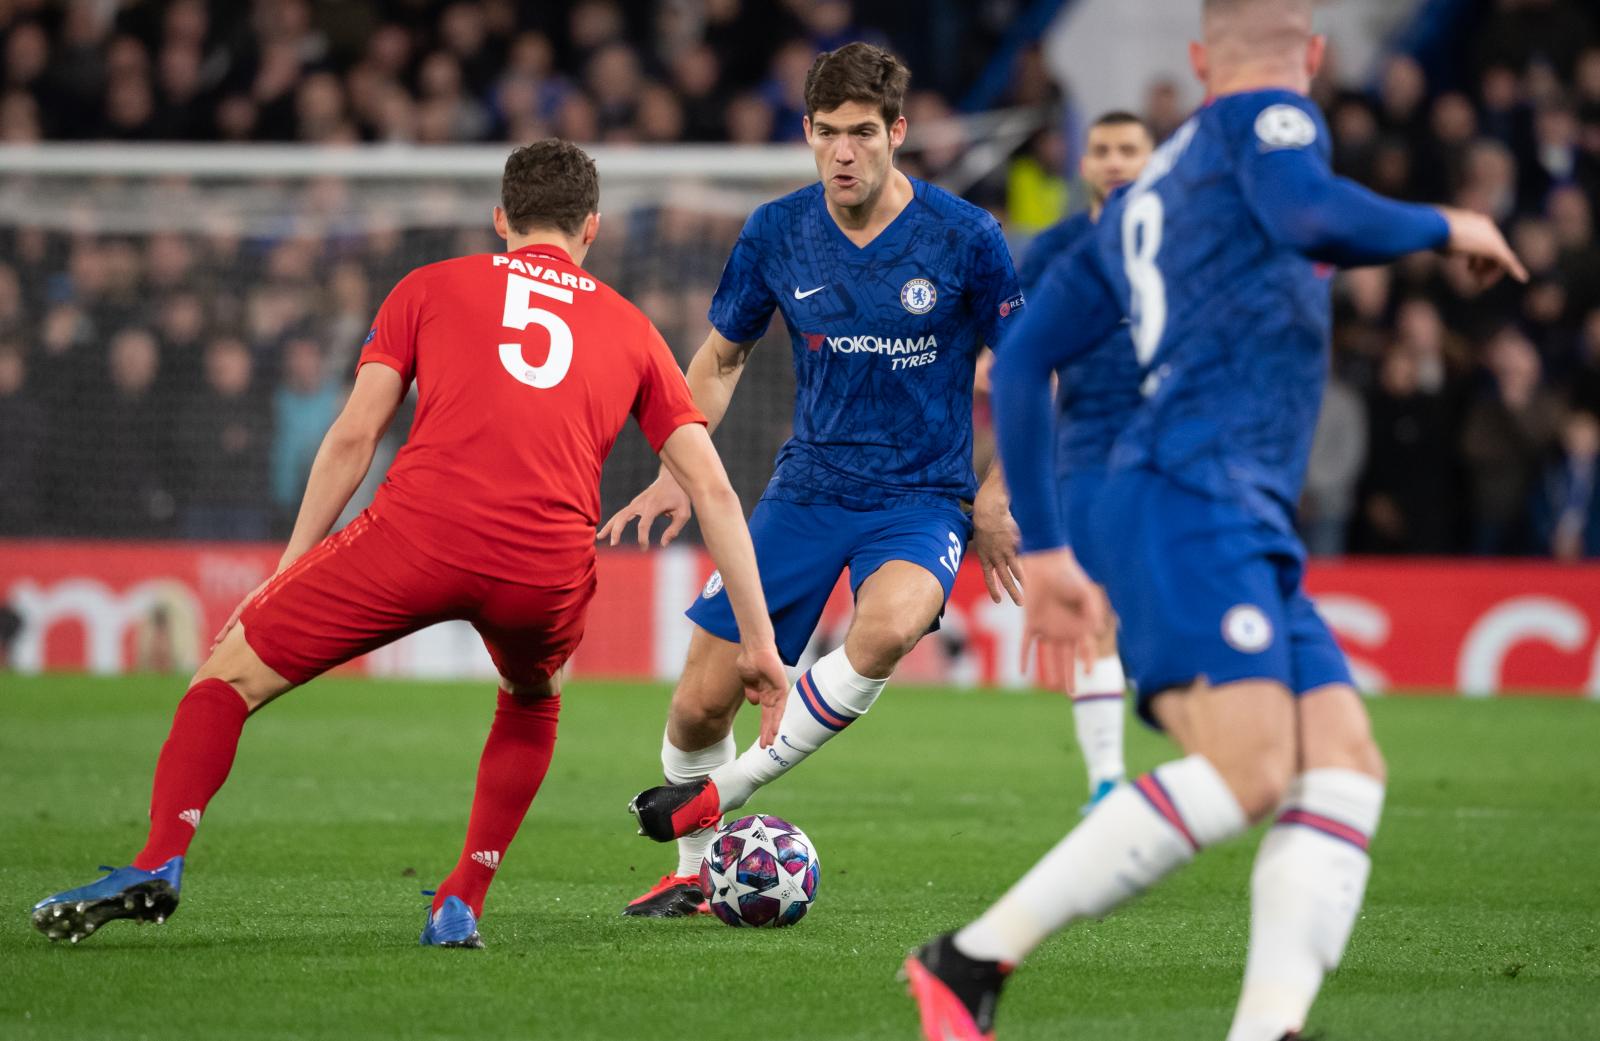 Челси — Норвич: прогноз на матч 36-го тура АПЛ